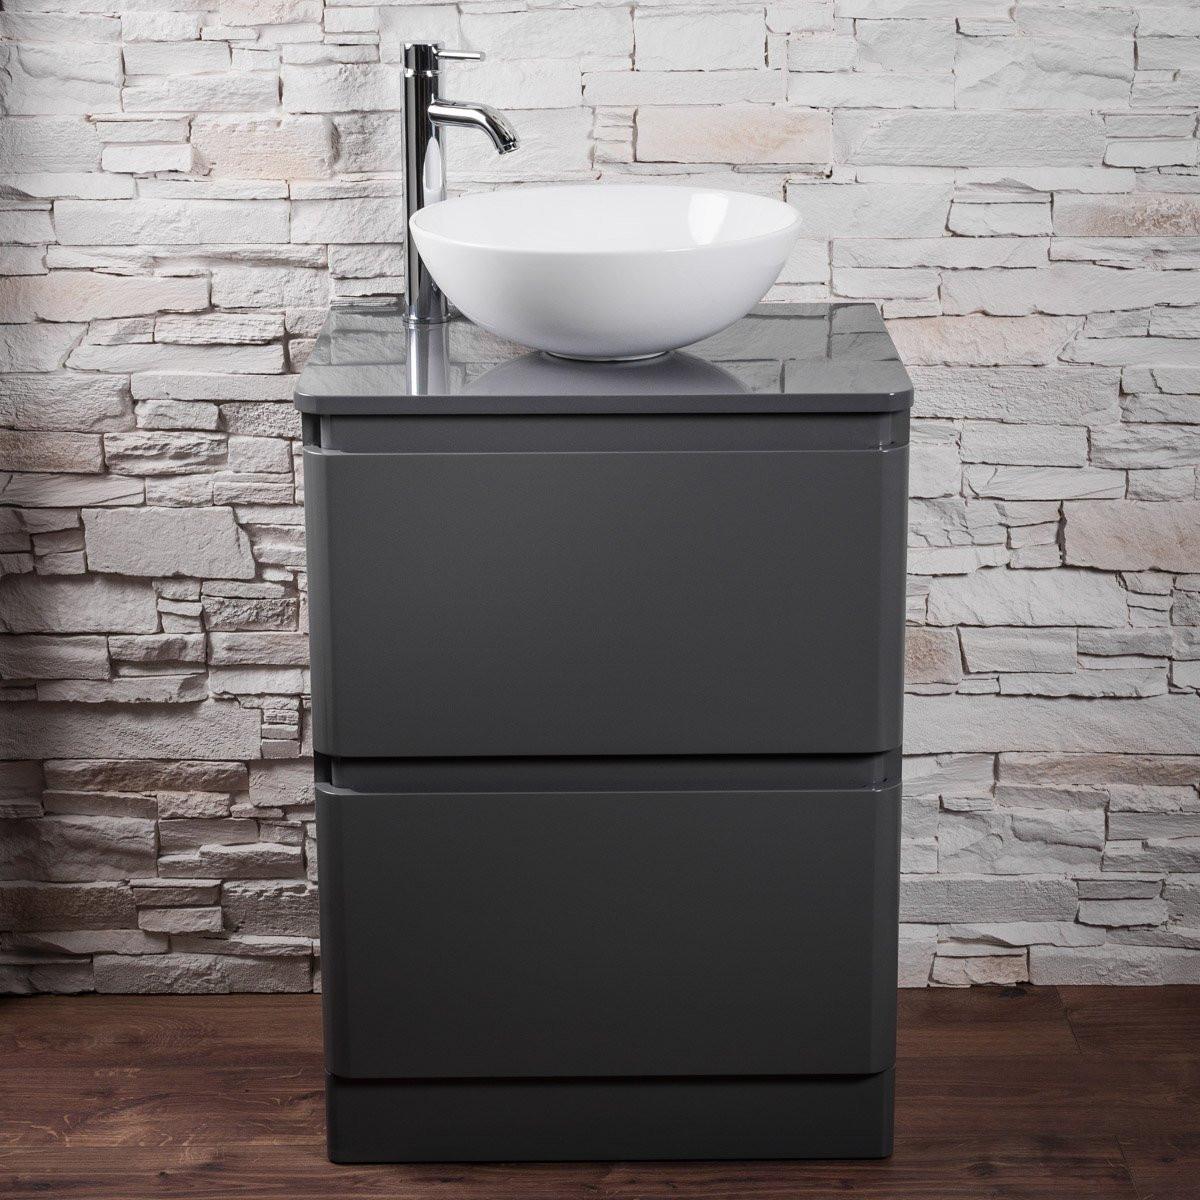 Bathroom Wall Hung Floor Standing Vanity Unit Grey Cabinet ...